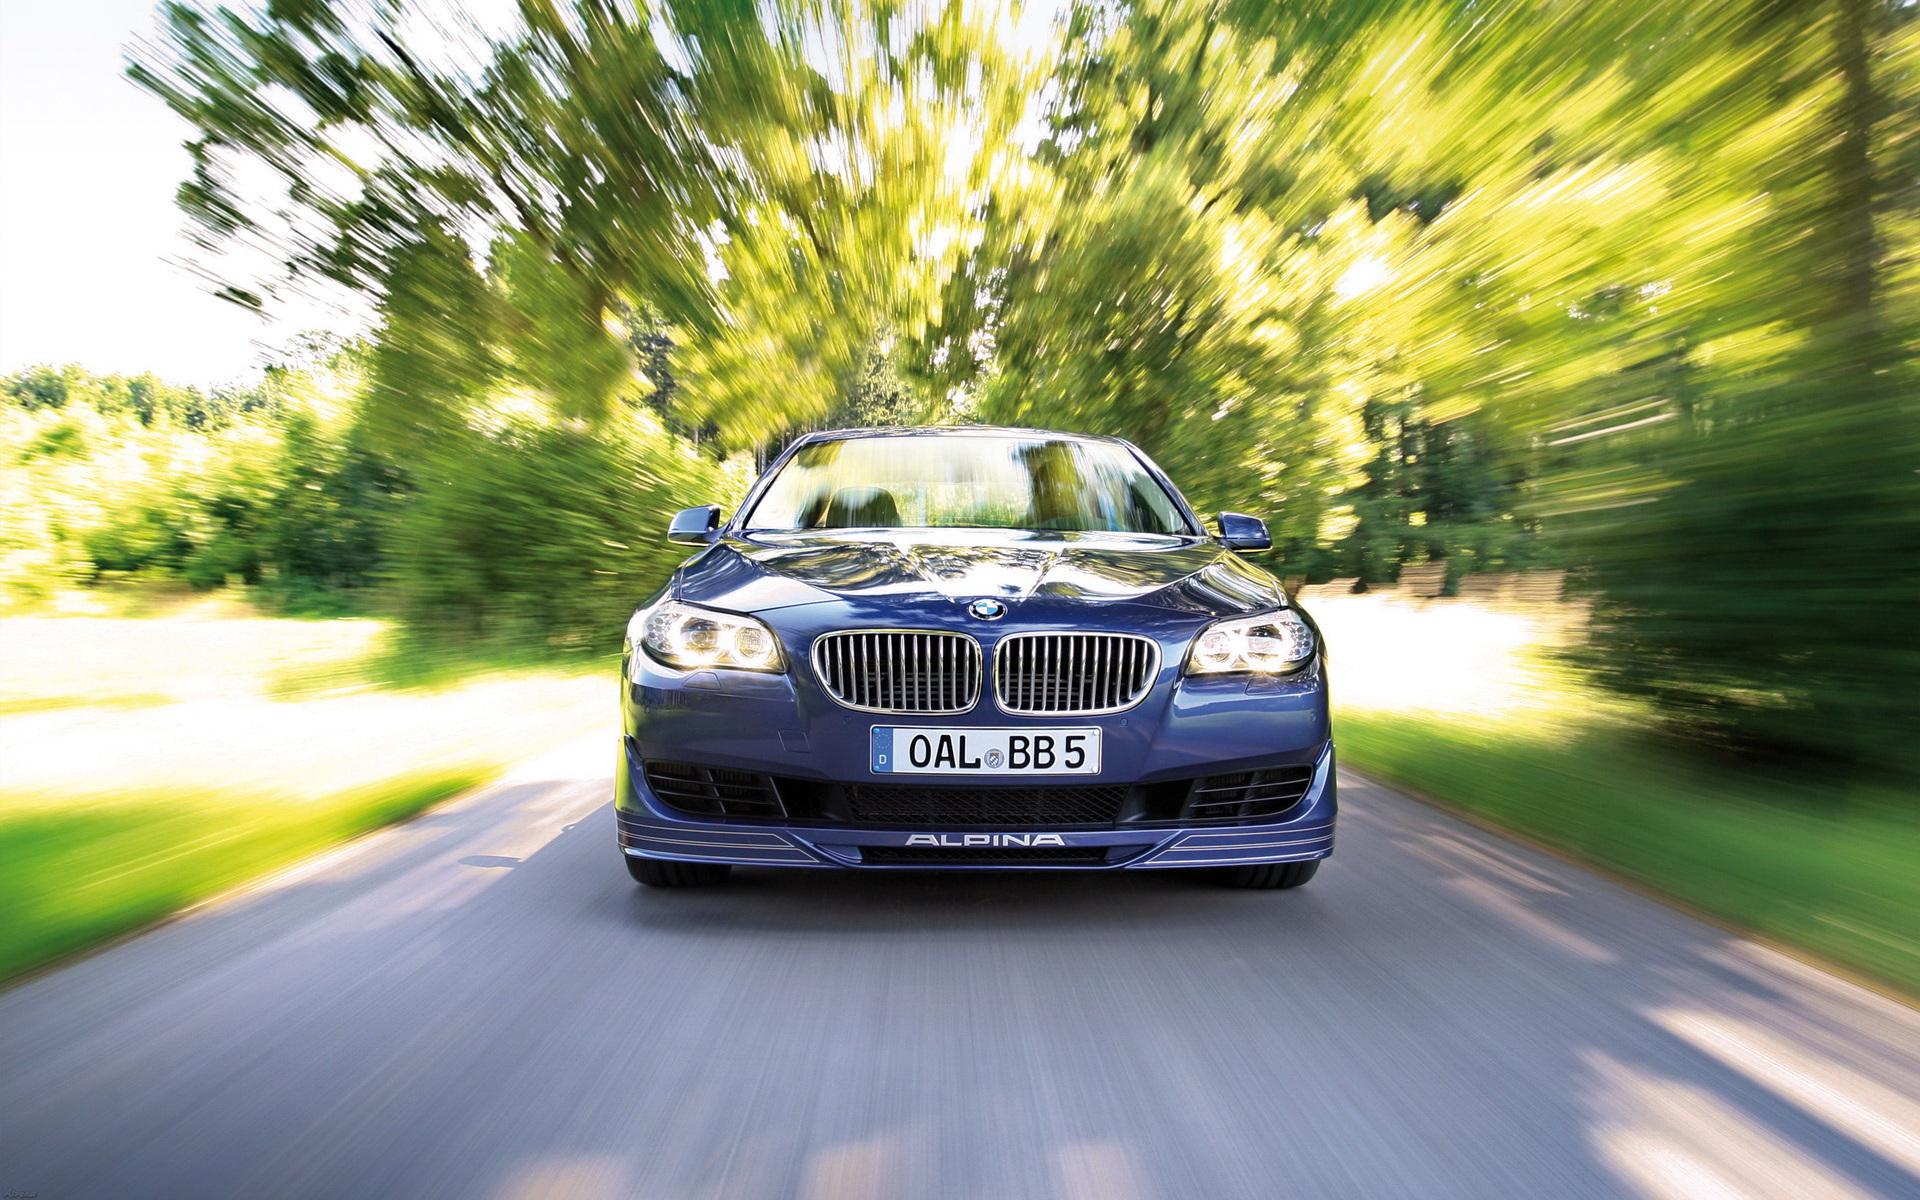 BMW HD Wallpaper | Background Image | 1920x1200 | ID ...